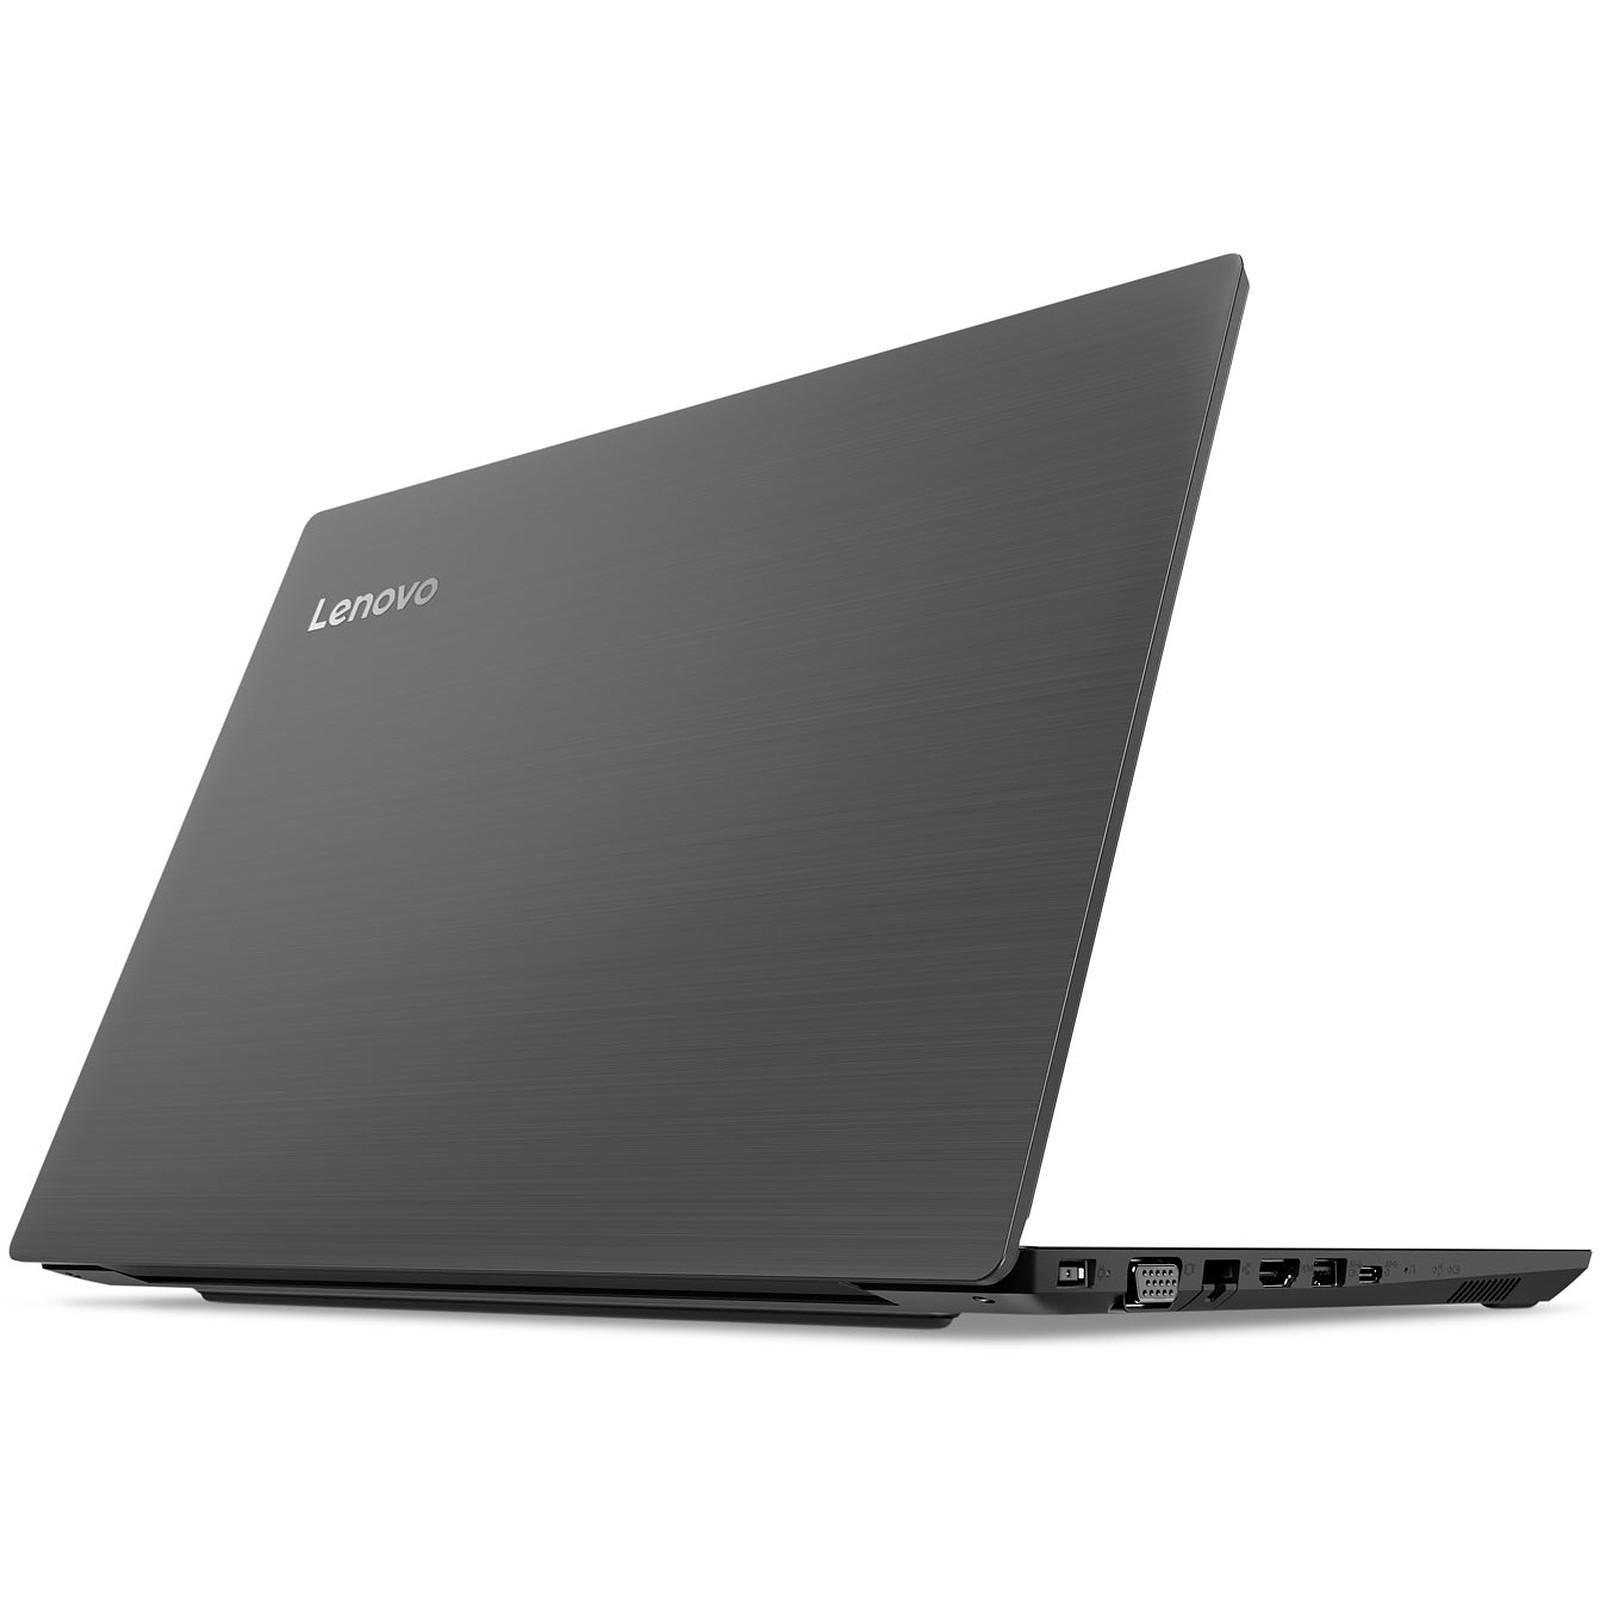 lenovo-v330-15ikb-black